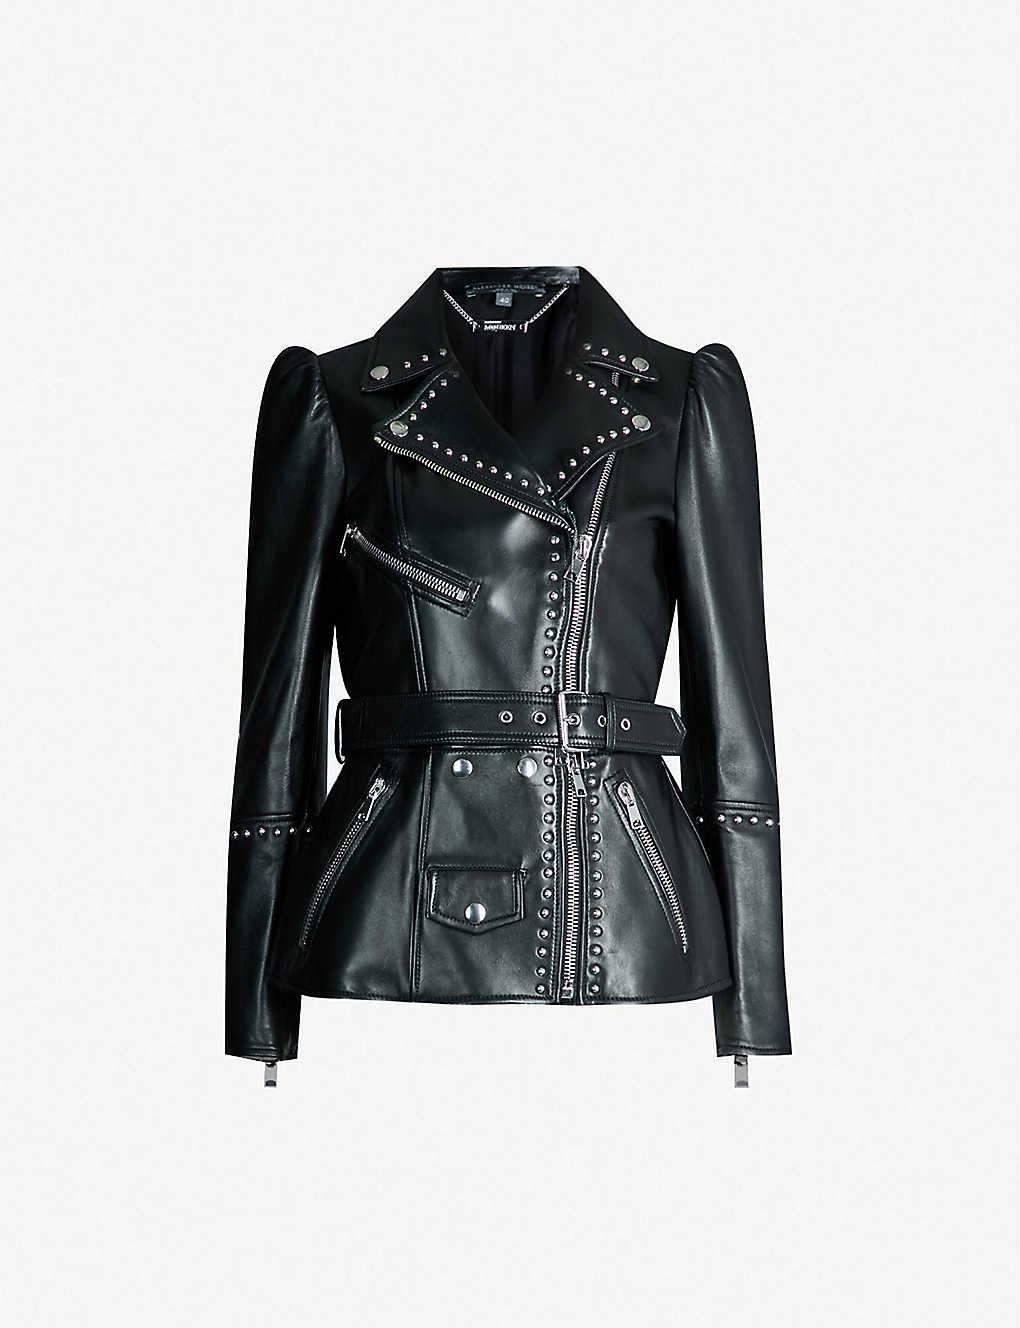 ALEXANDER MCQUEEN - Studded leather biker jacket   Selfridges.com 42c410b4bf8